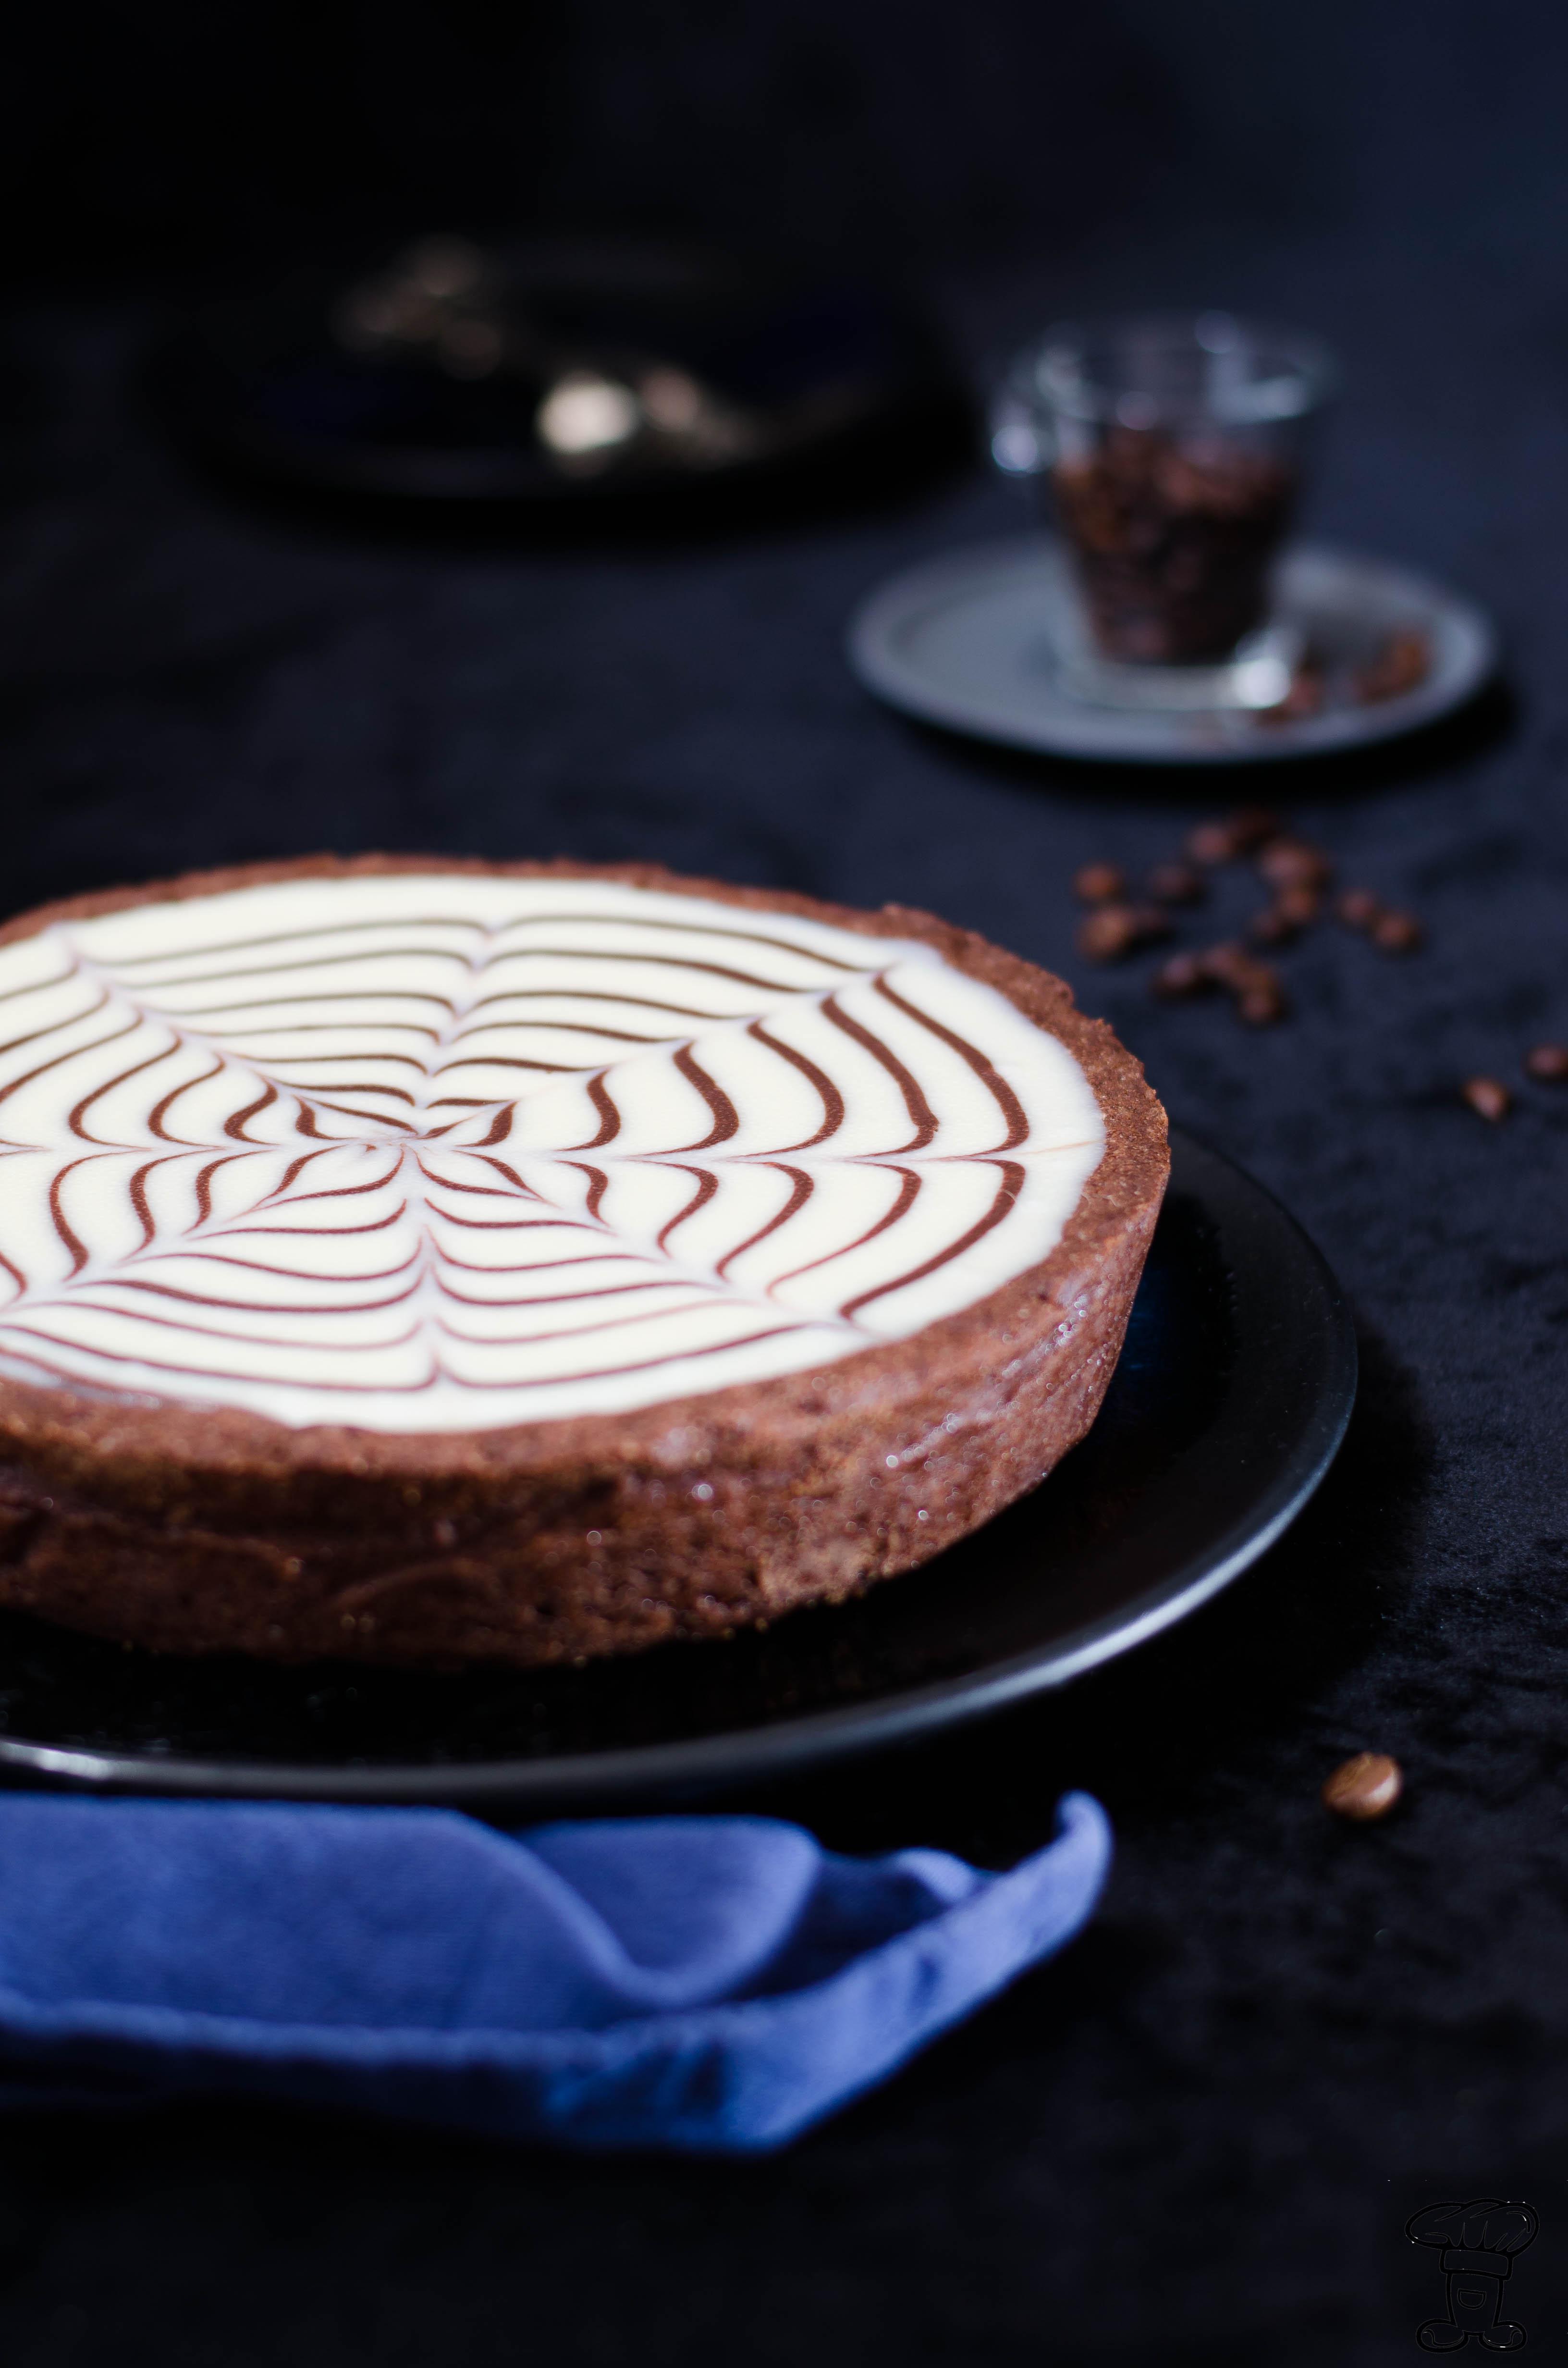 torta_mocaccino_knam1 Torta mocaccino di Knam